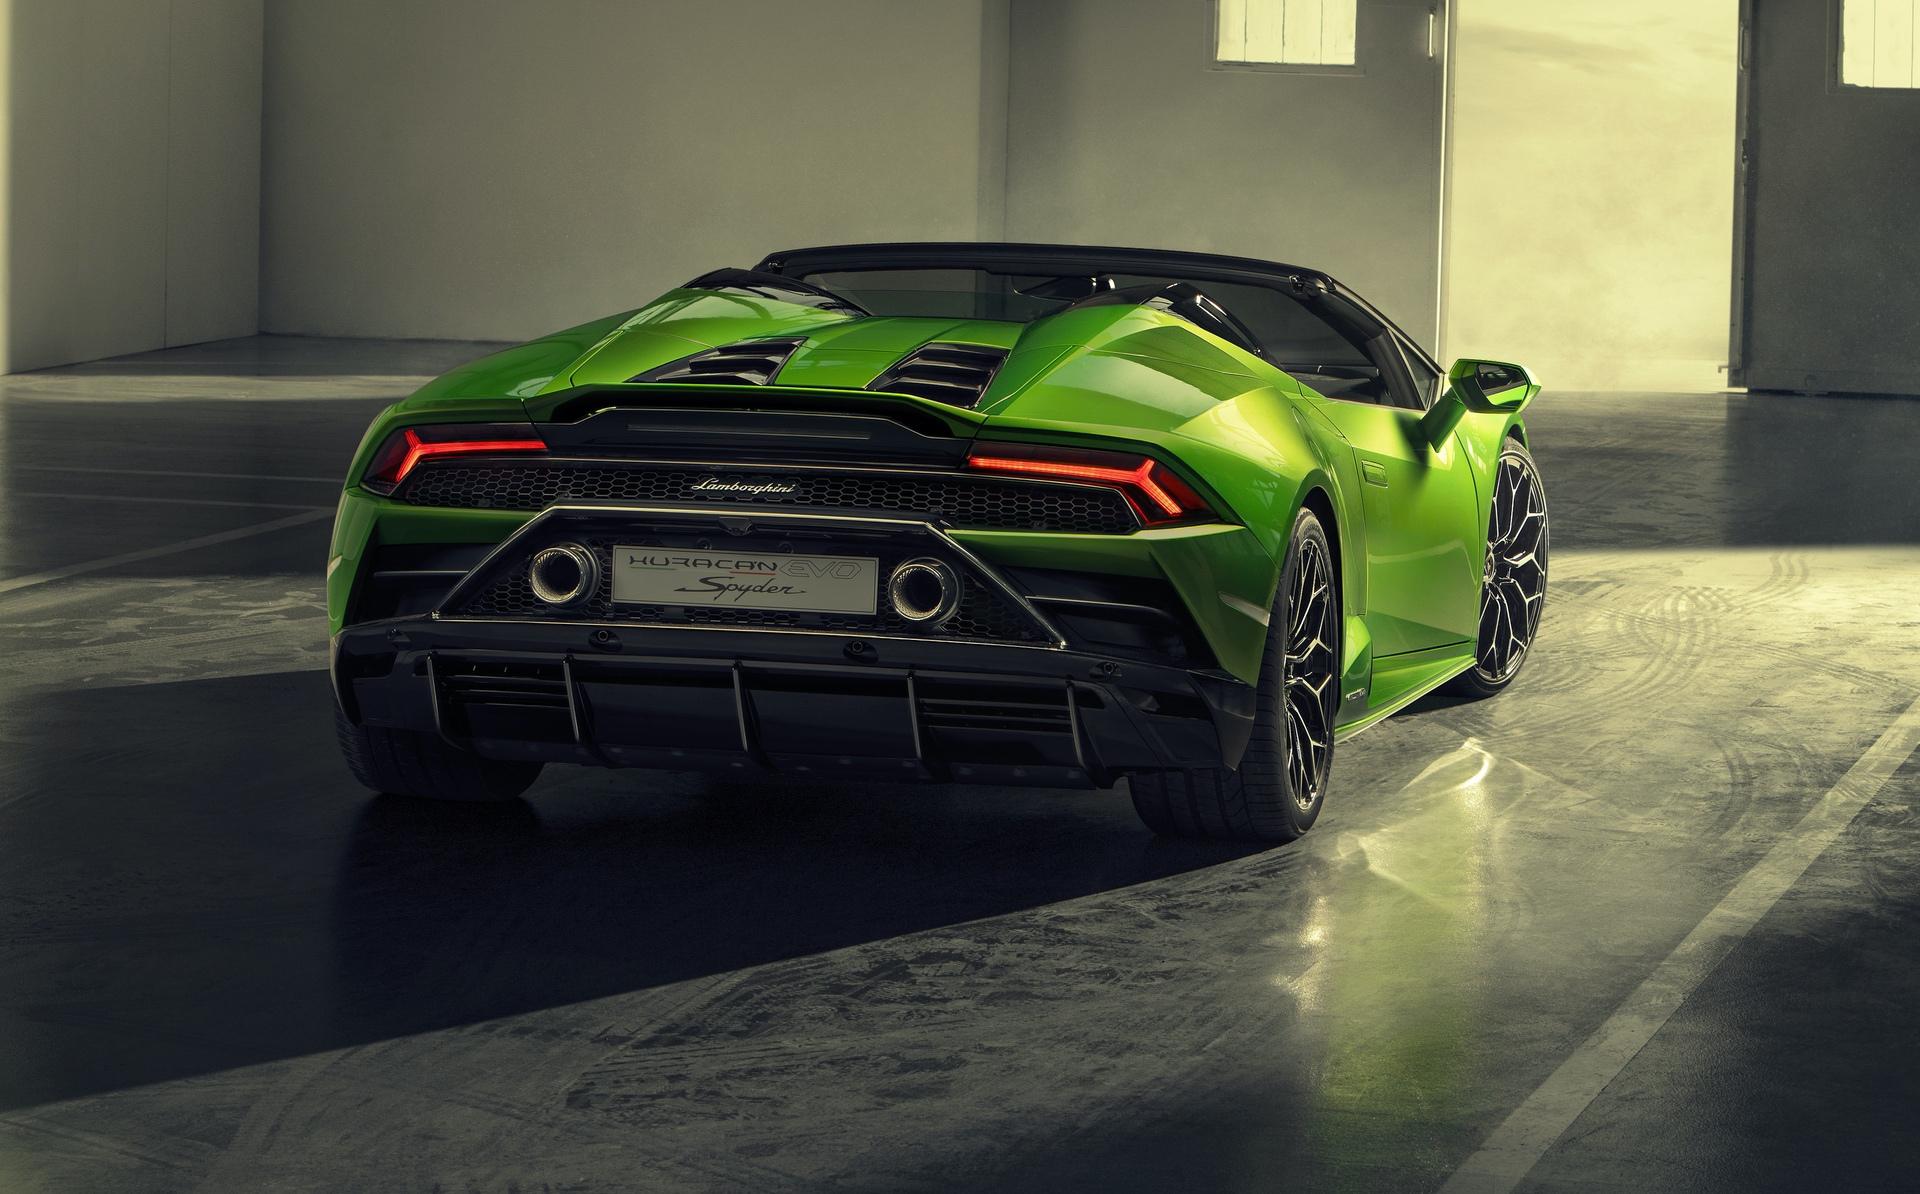 Lamborghini_Huracan_Evo_Spyder_0019